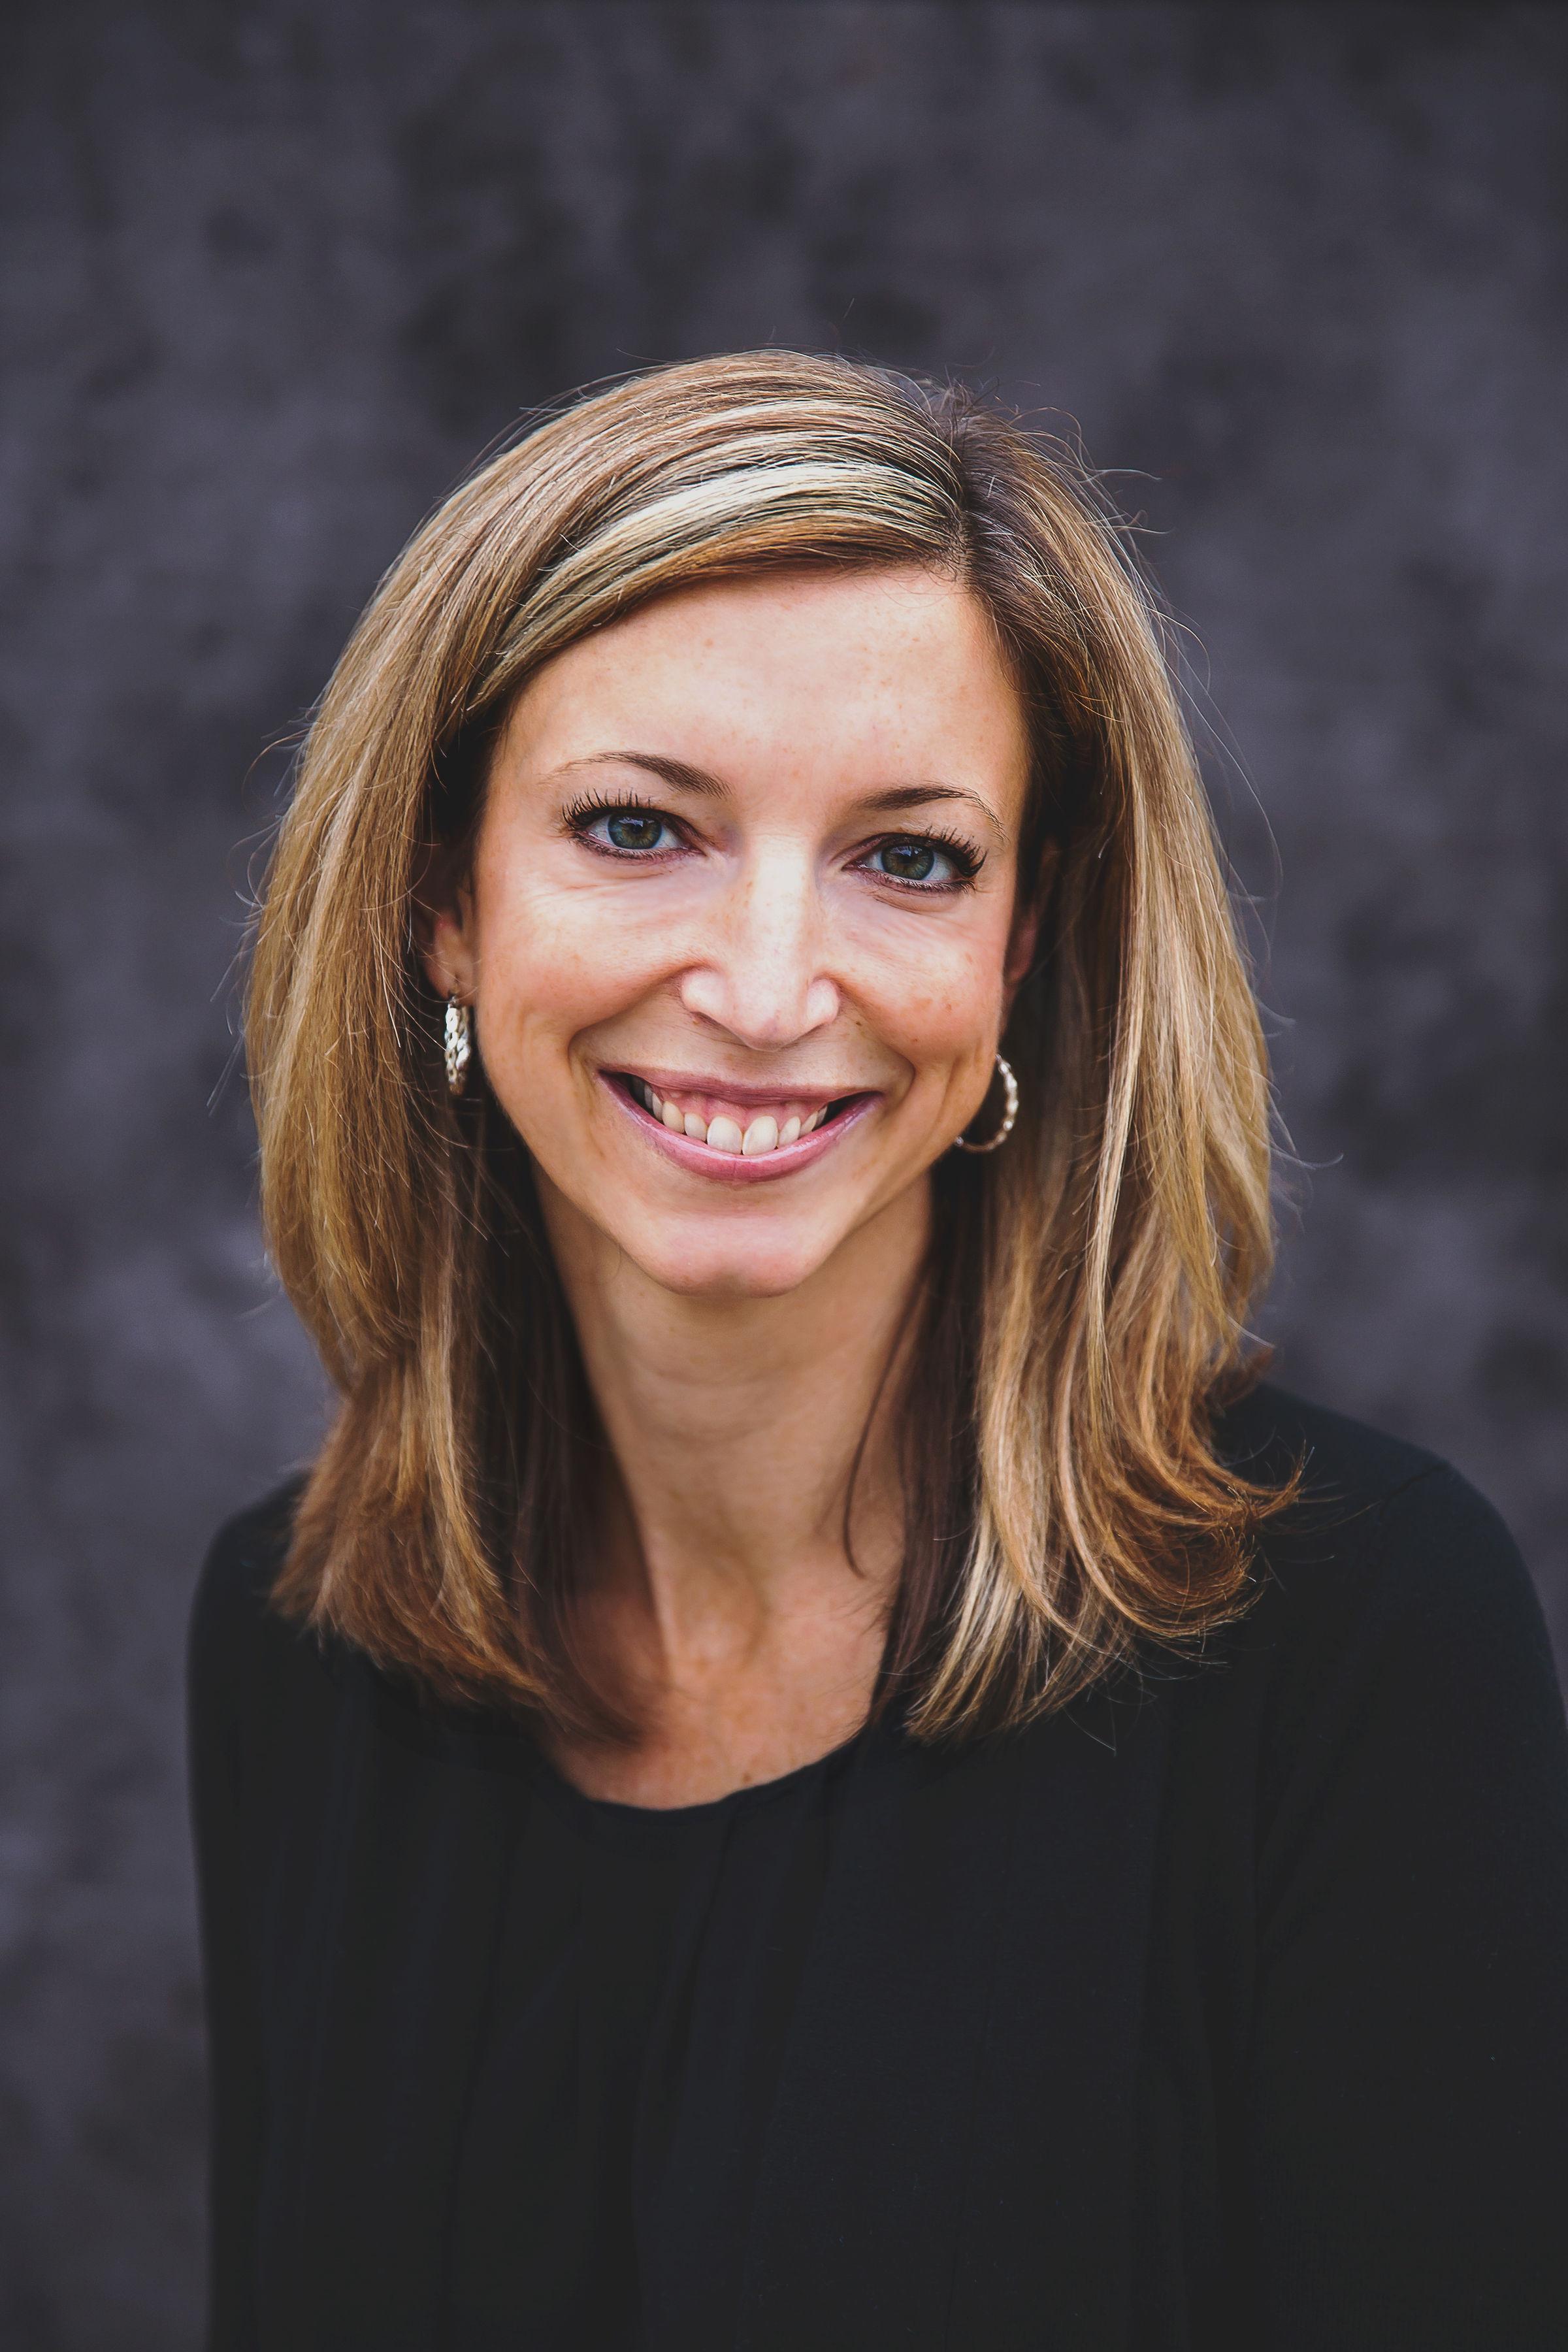 Amy Golombeski